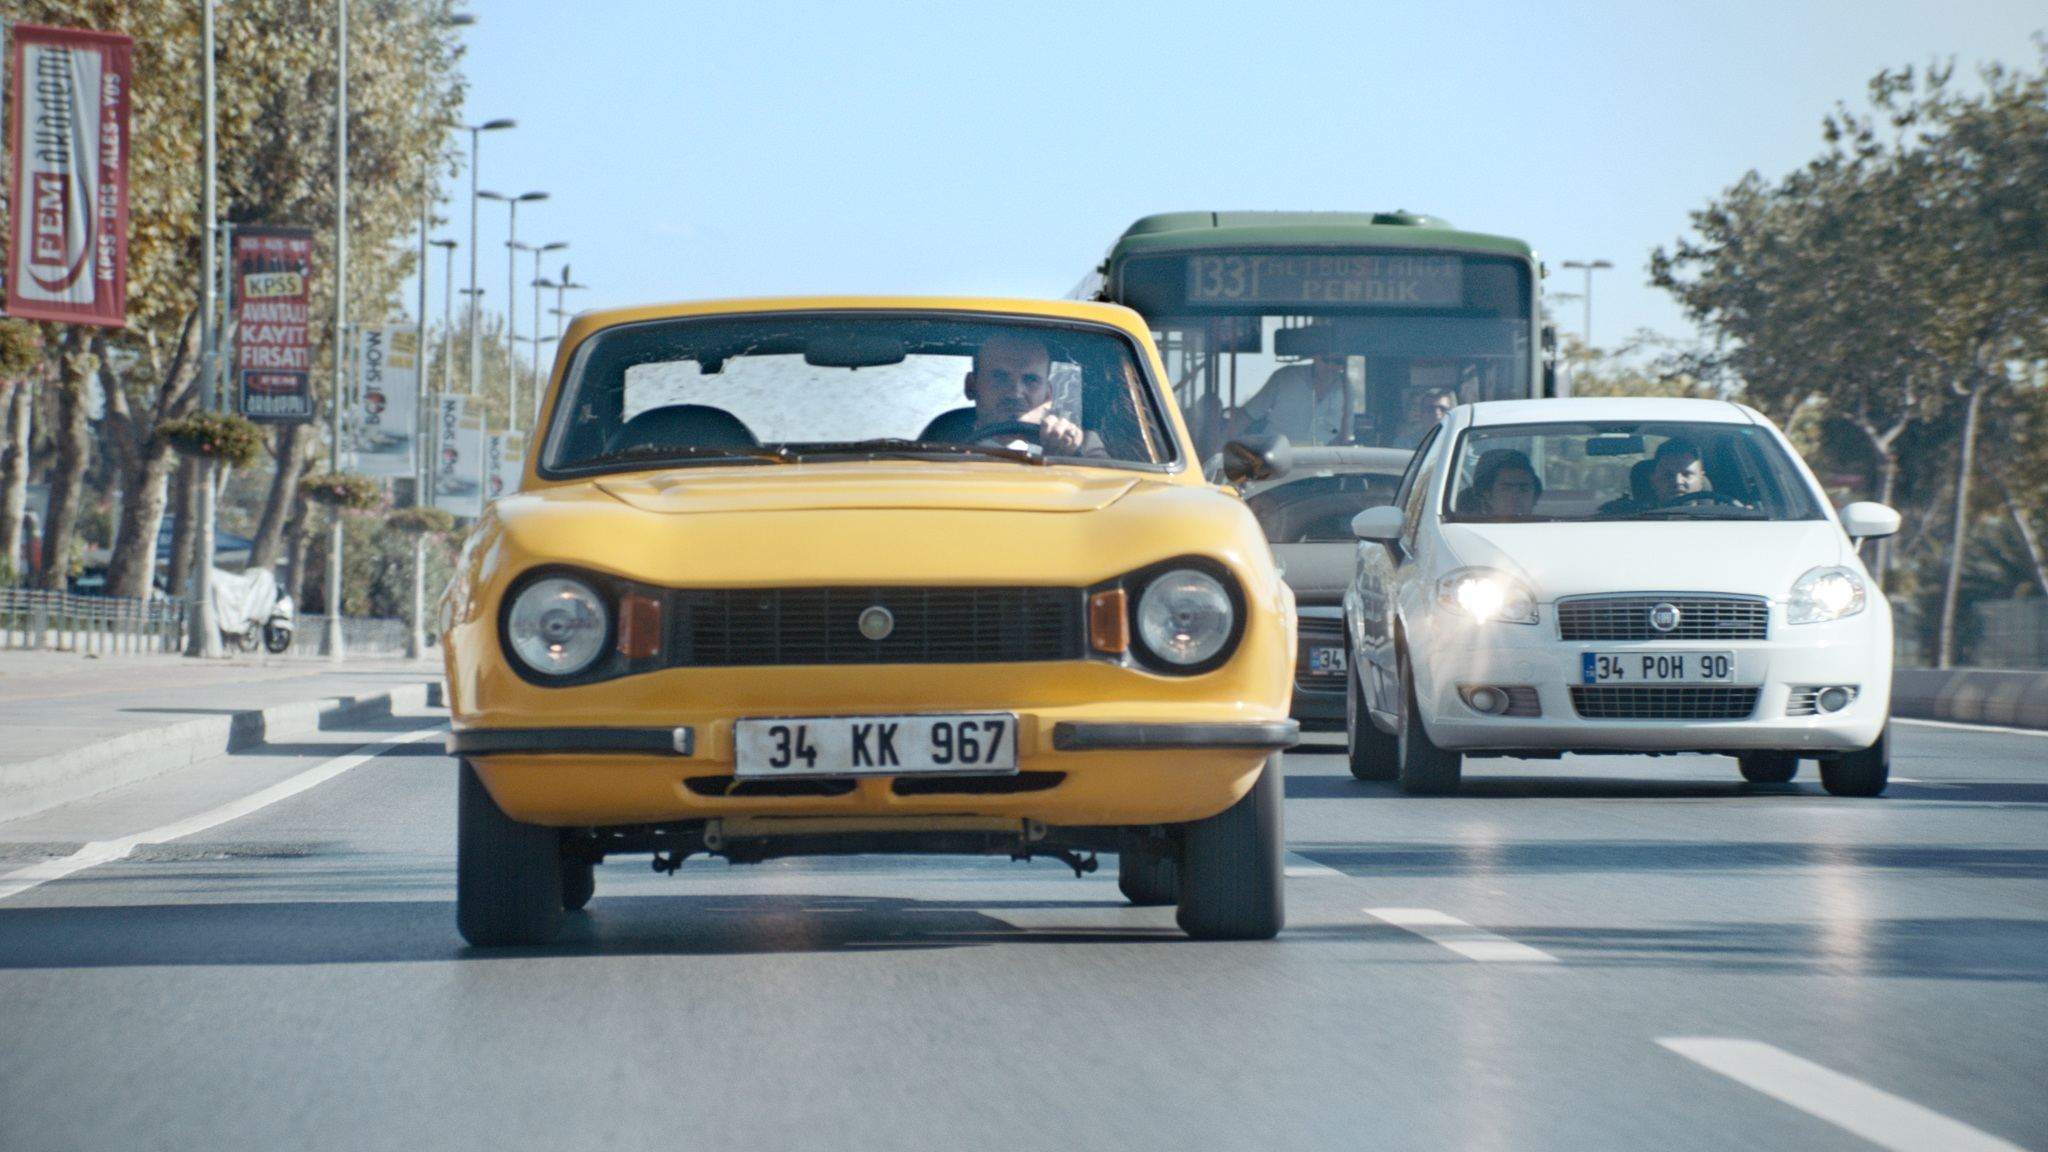 Transformers İstanbul'a İstanbul Yeşilçam'a ışınlandı: Zaman Makinesi 1973